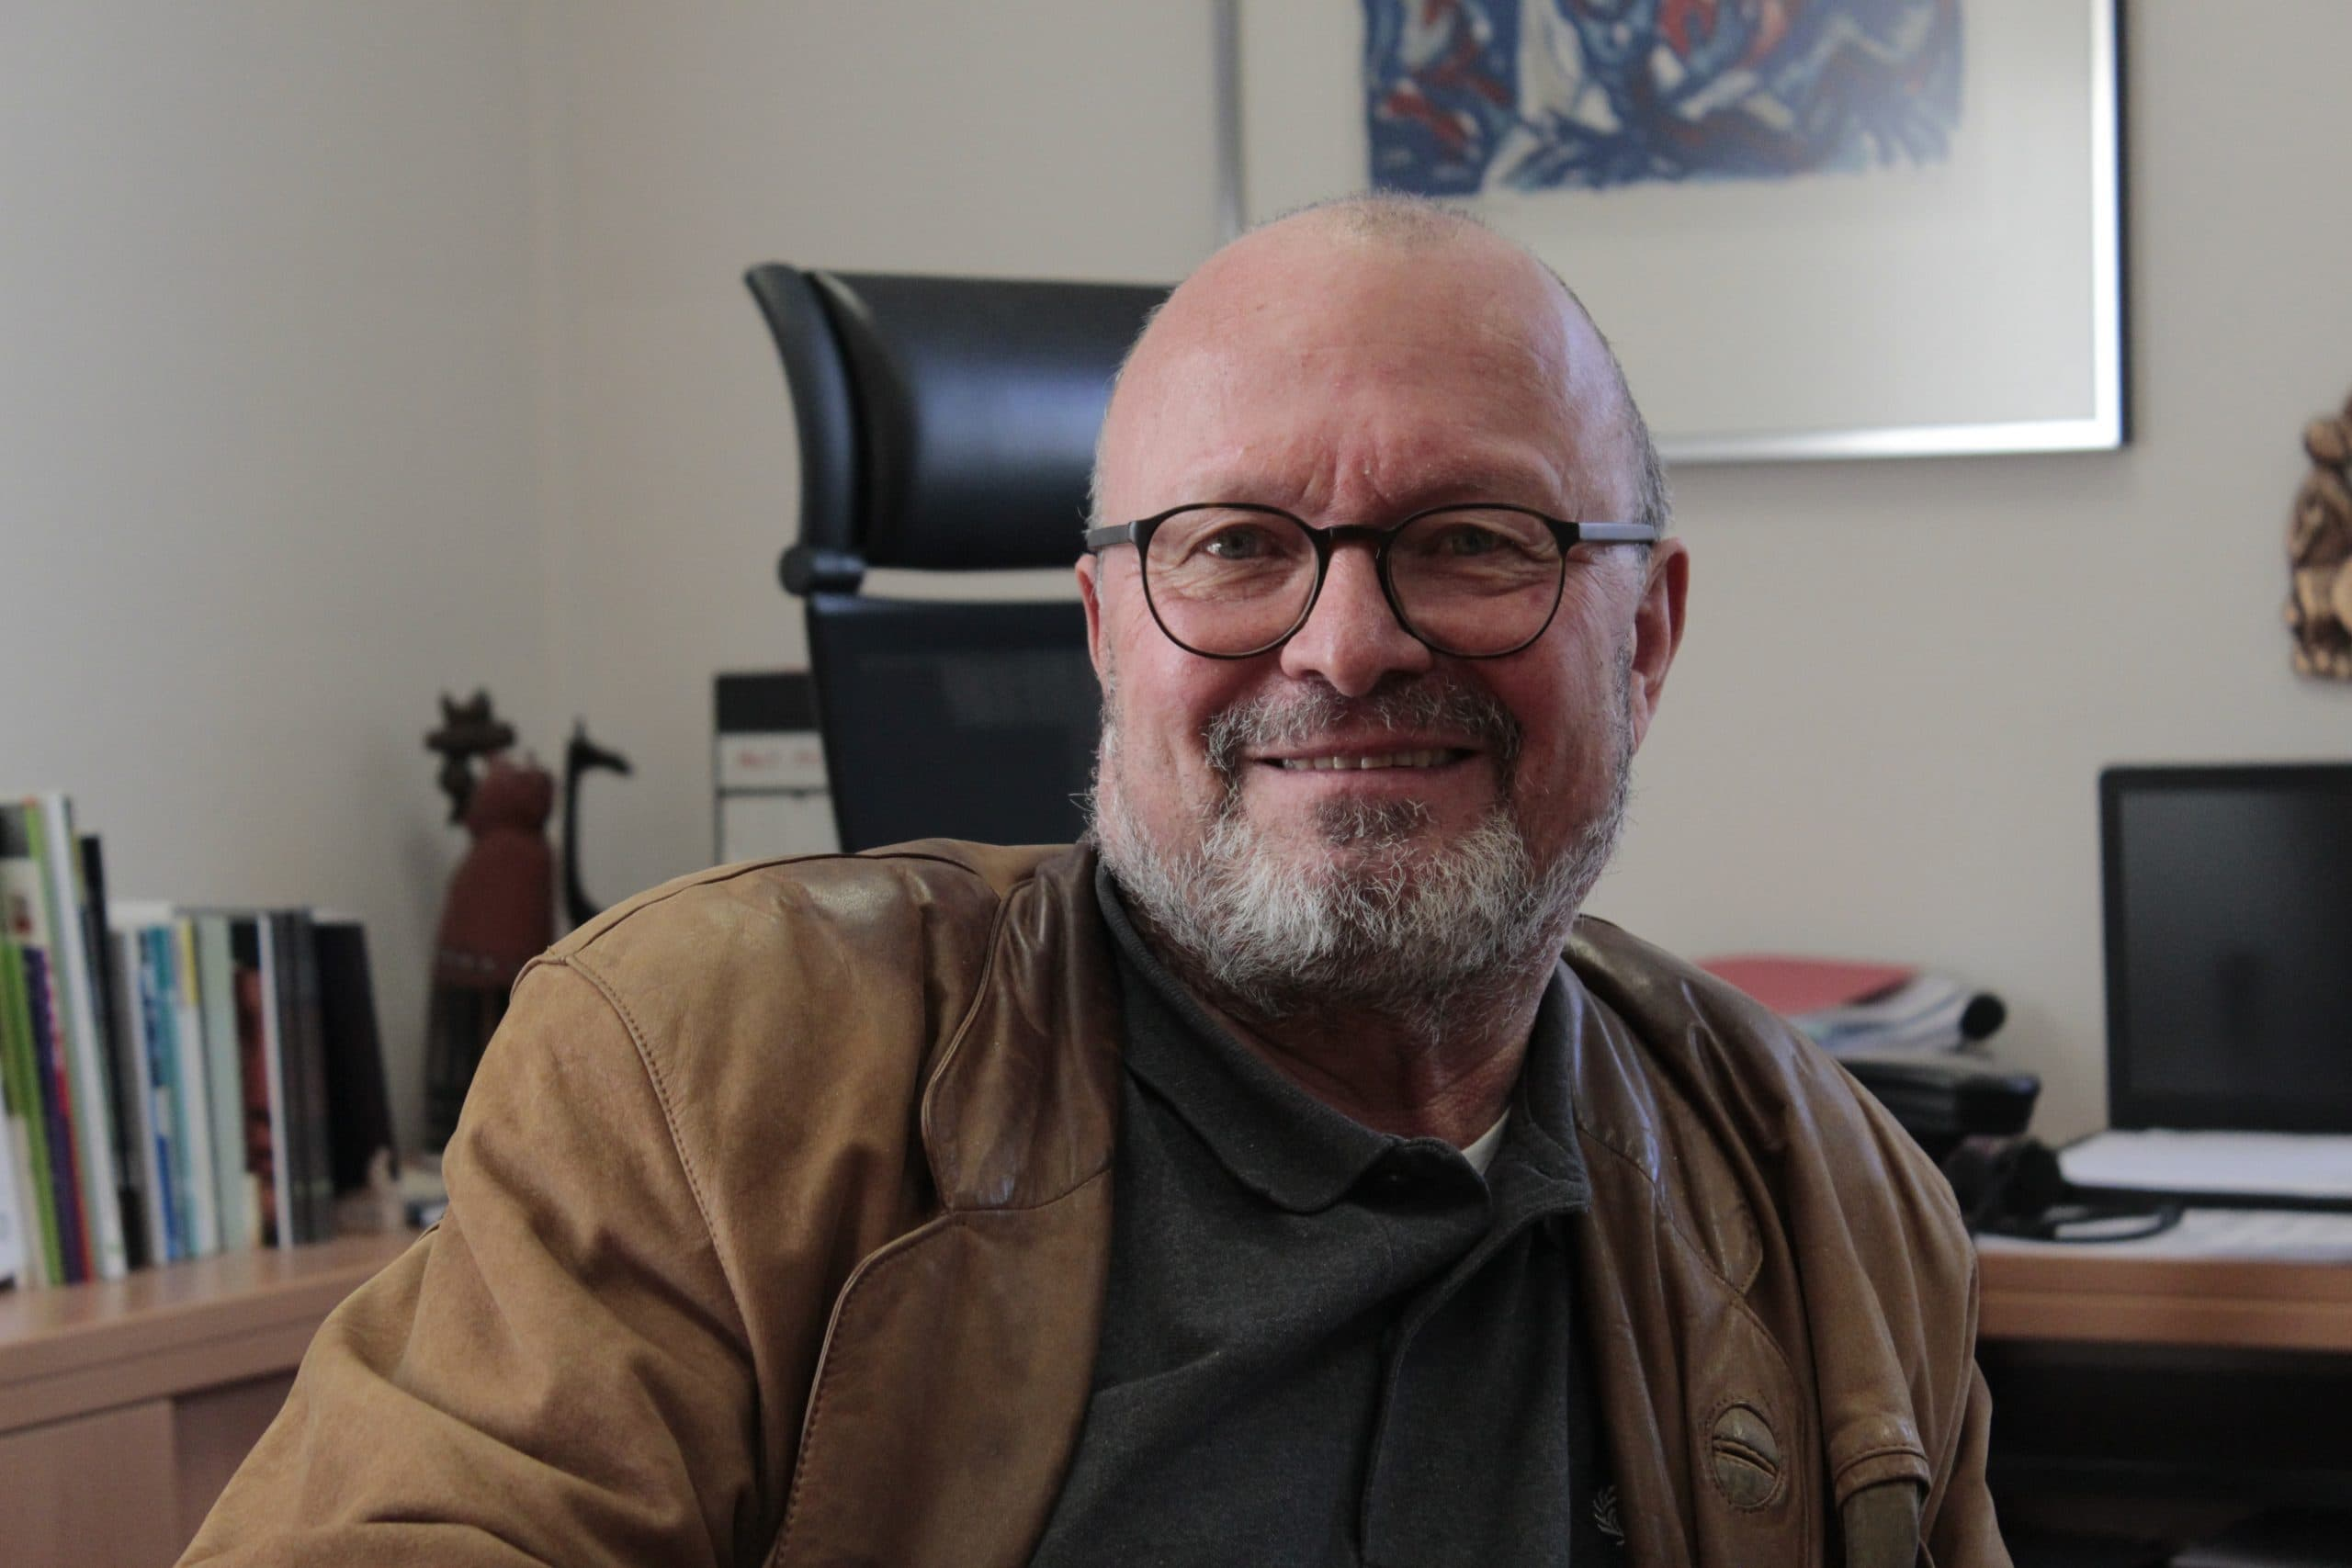 Videobotschaften statt großer Feier Gesamtleiter Reinhard Mehringer nimmt leise Abschied aus dem Pater-Rupert-Mayer-Zentrum